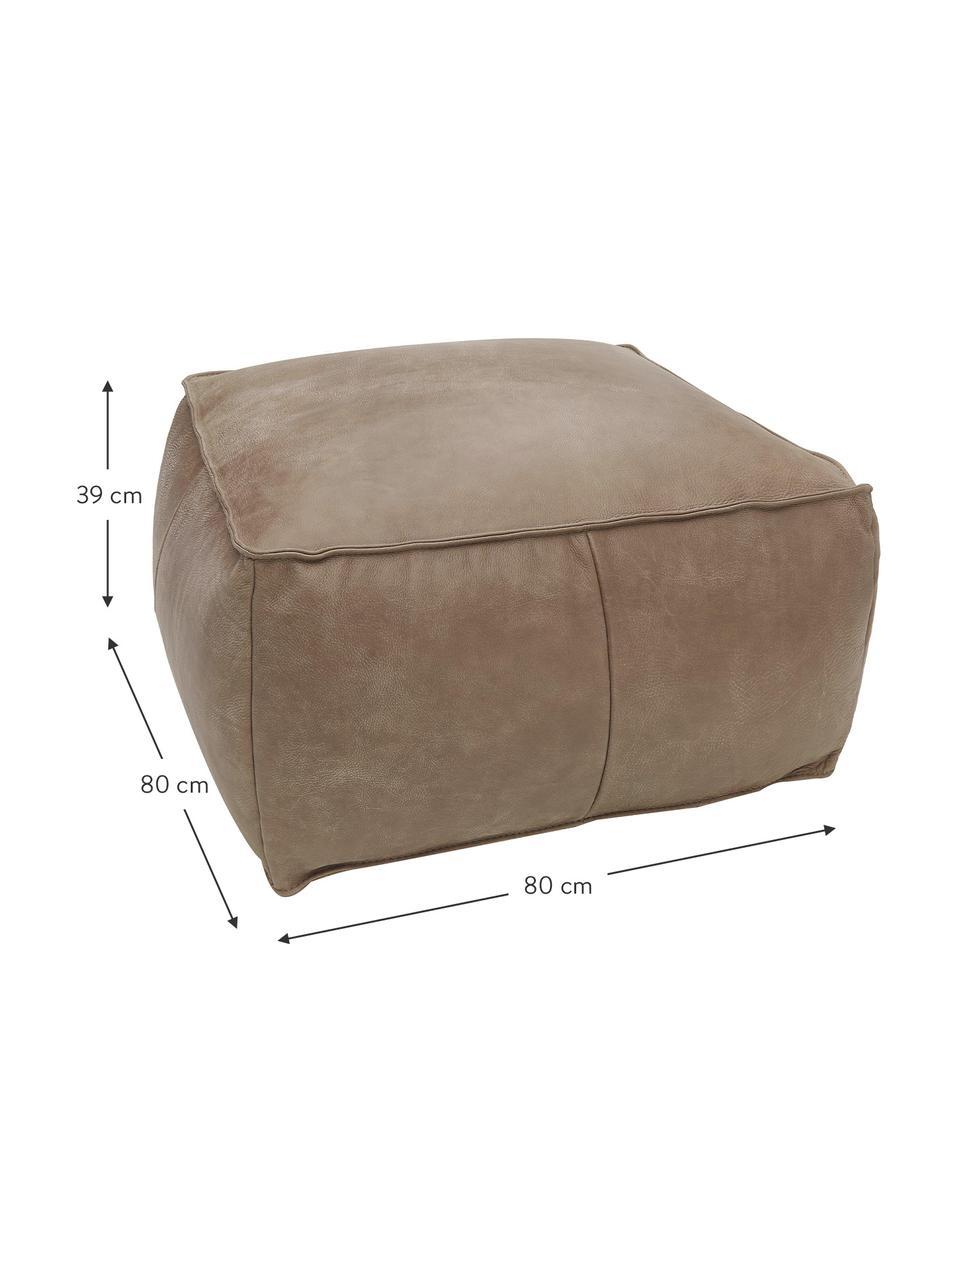 Cuscino da pavimento in pelle Porthos, Rivestimento: 100% pelle anilina, Marrone, Larg. 80 x Alt. 33 cm